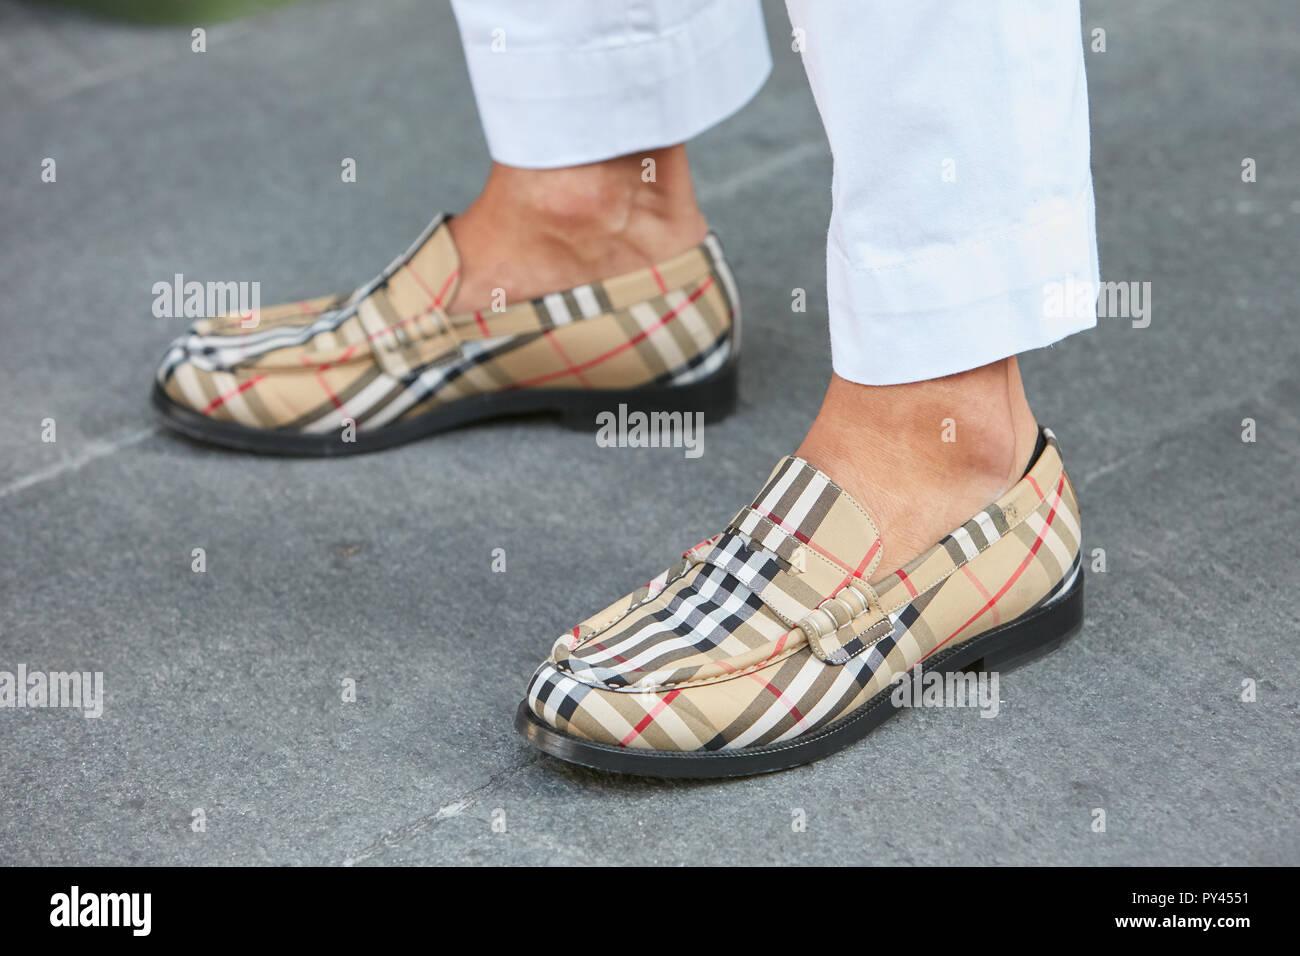 Stock Burberry Shoes Fotos amp; Shoes Alamy Burberry Immagini IrHwqZxYr